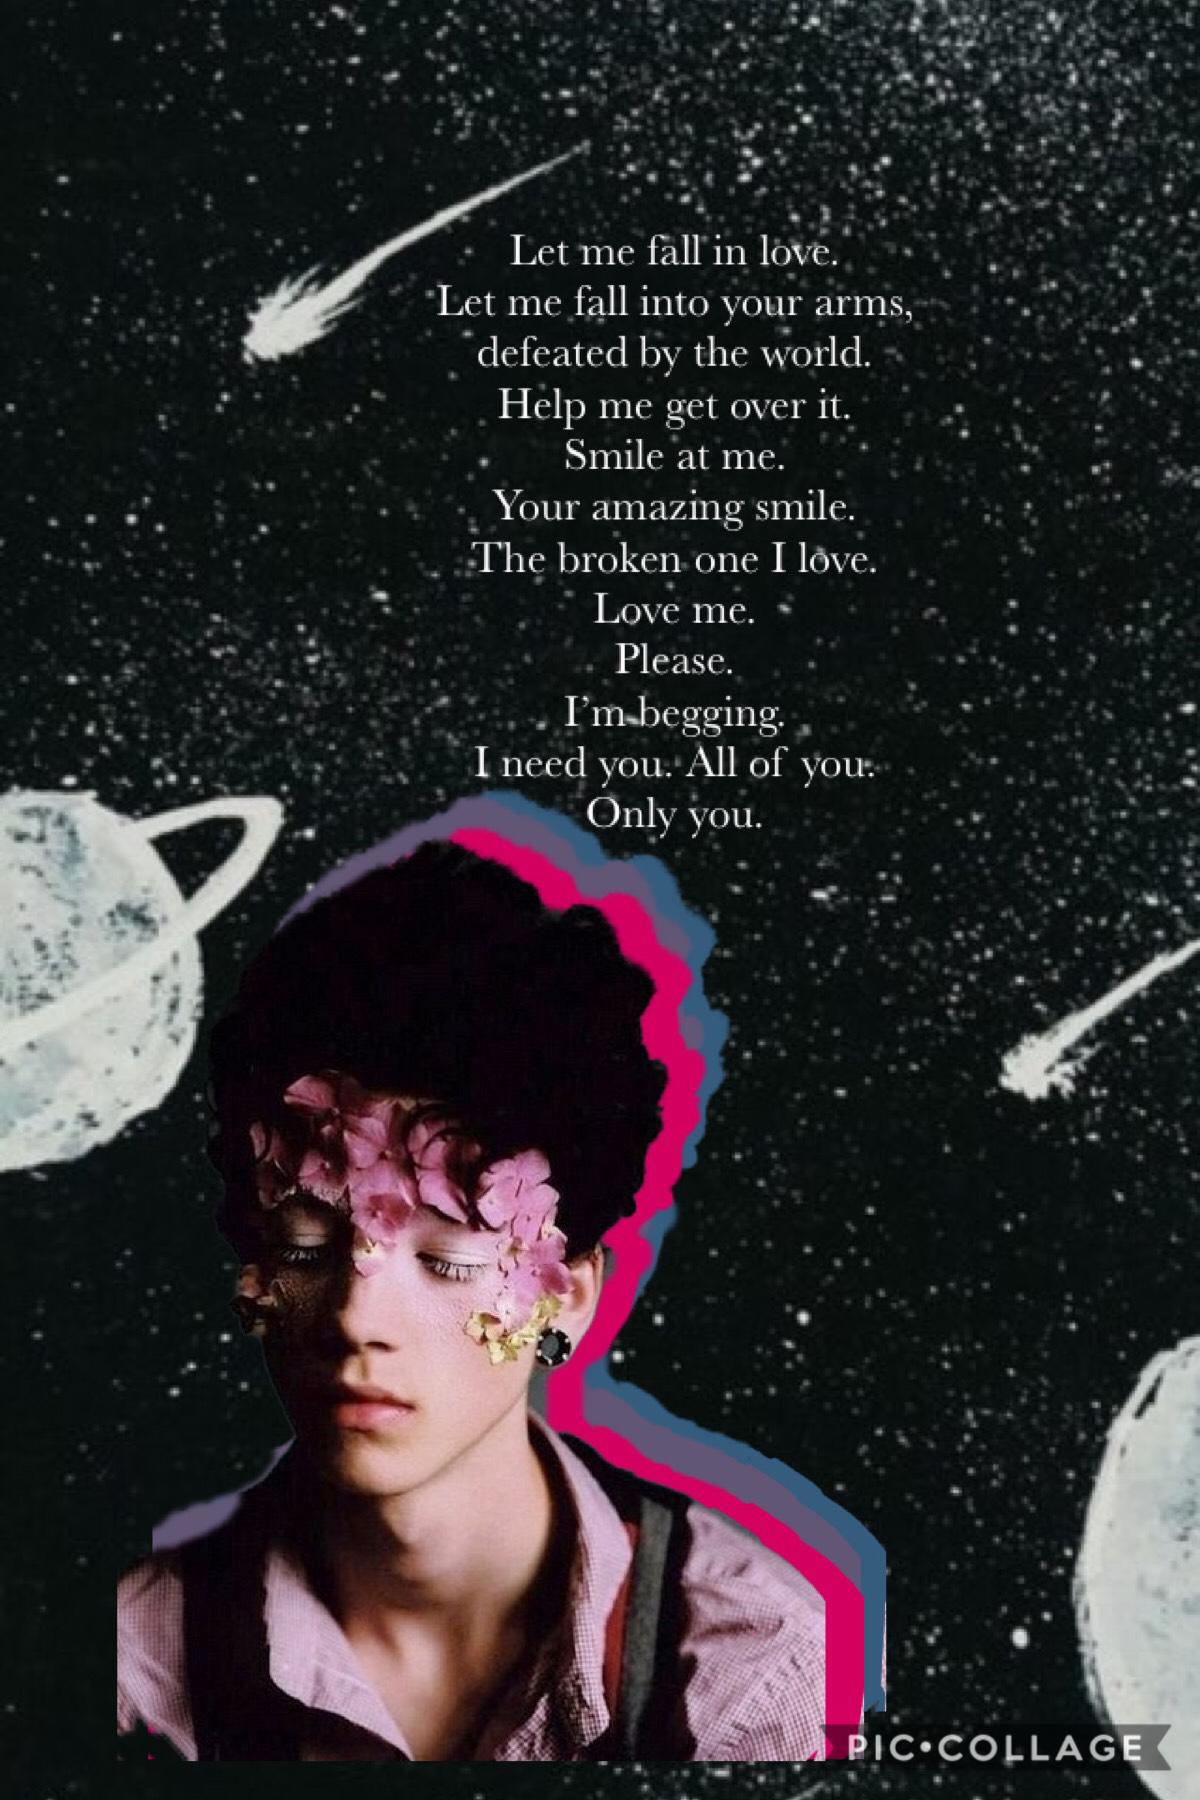 Collage by Skyelovesyoutube